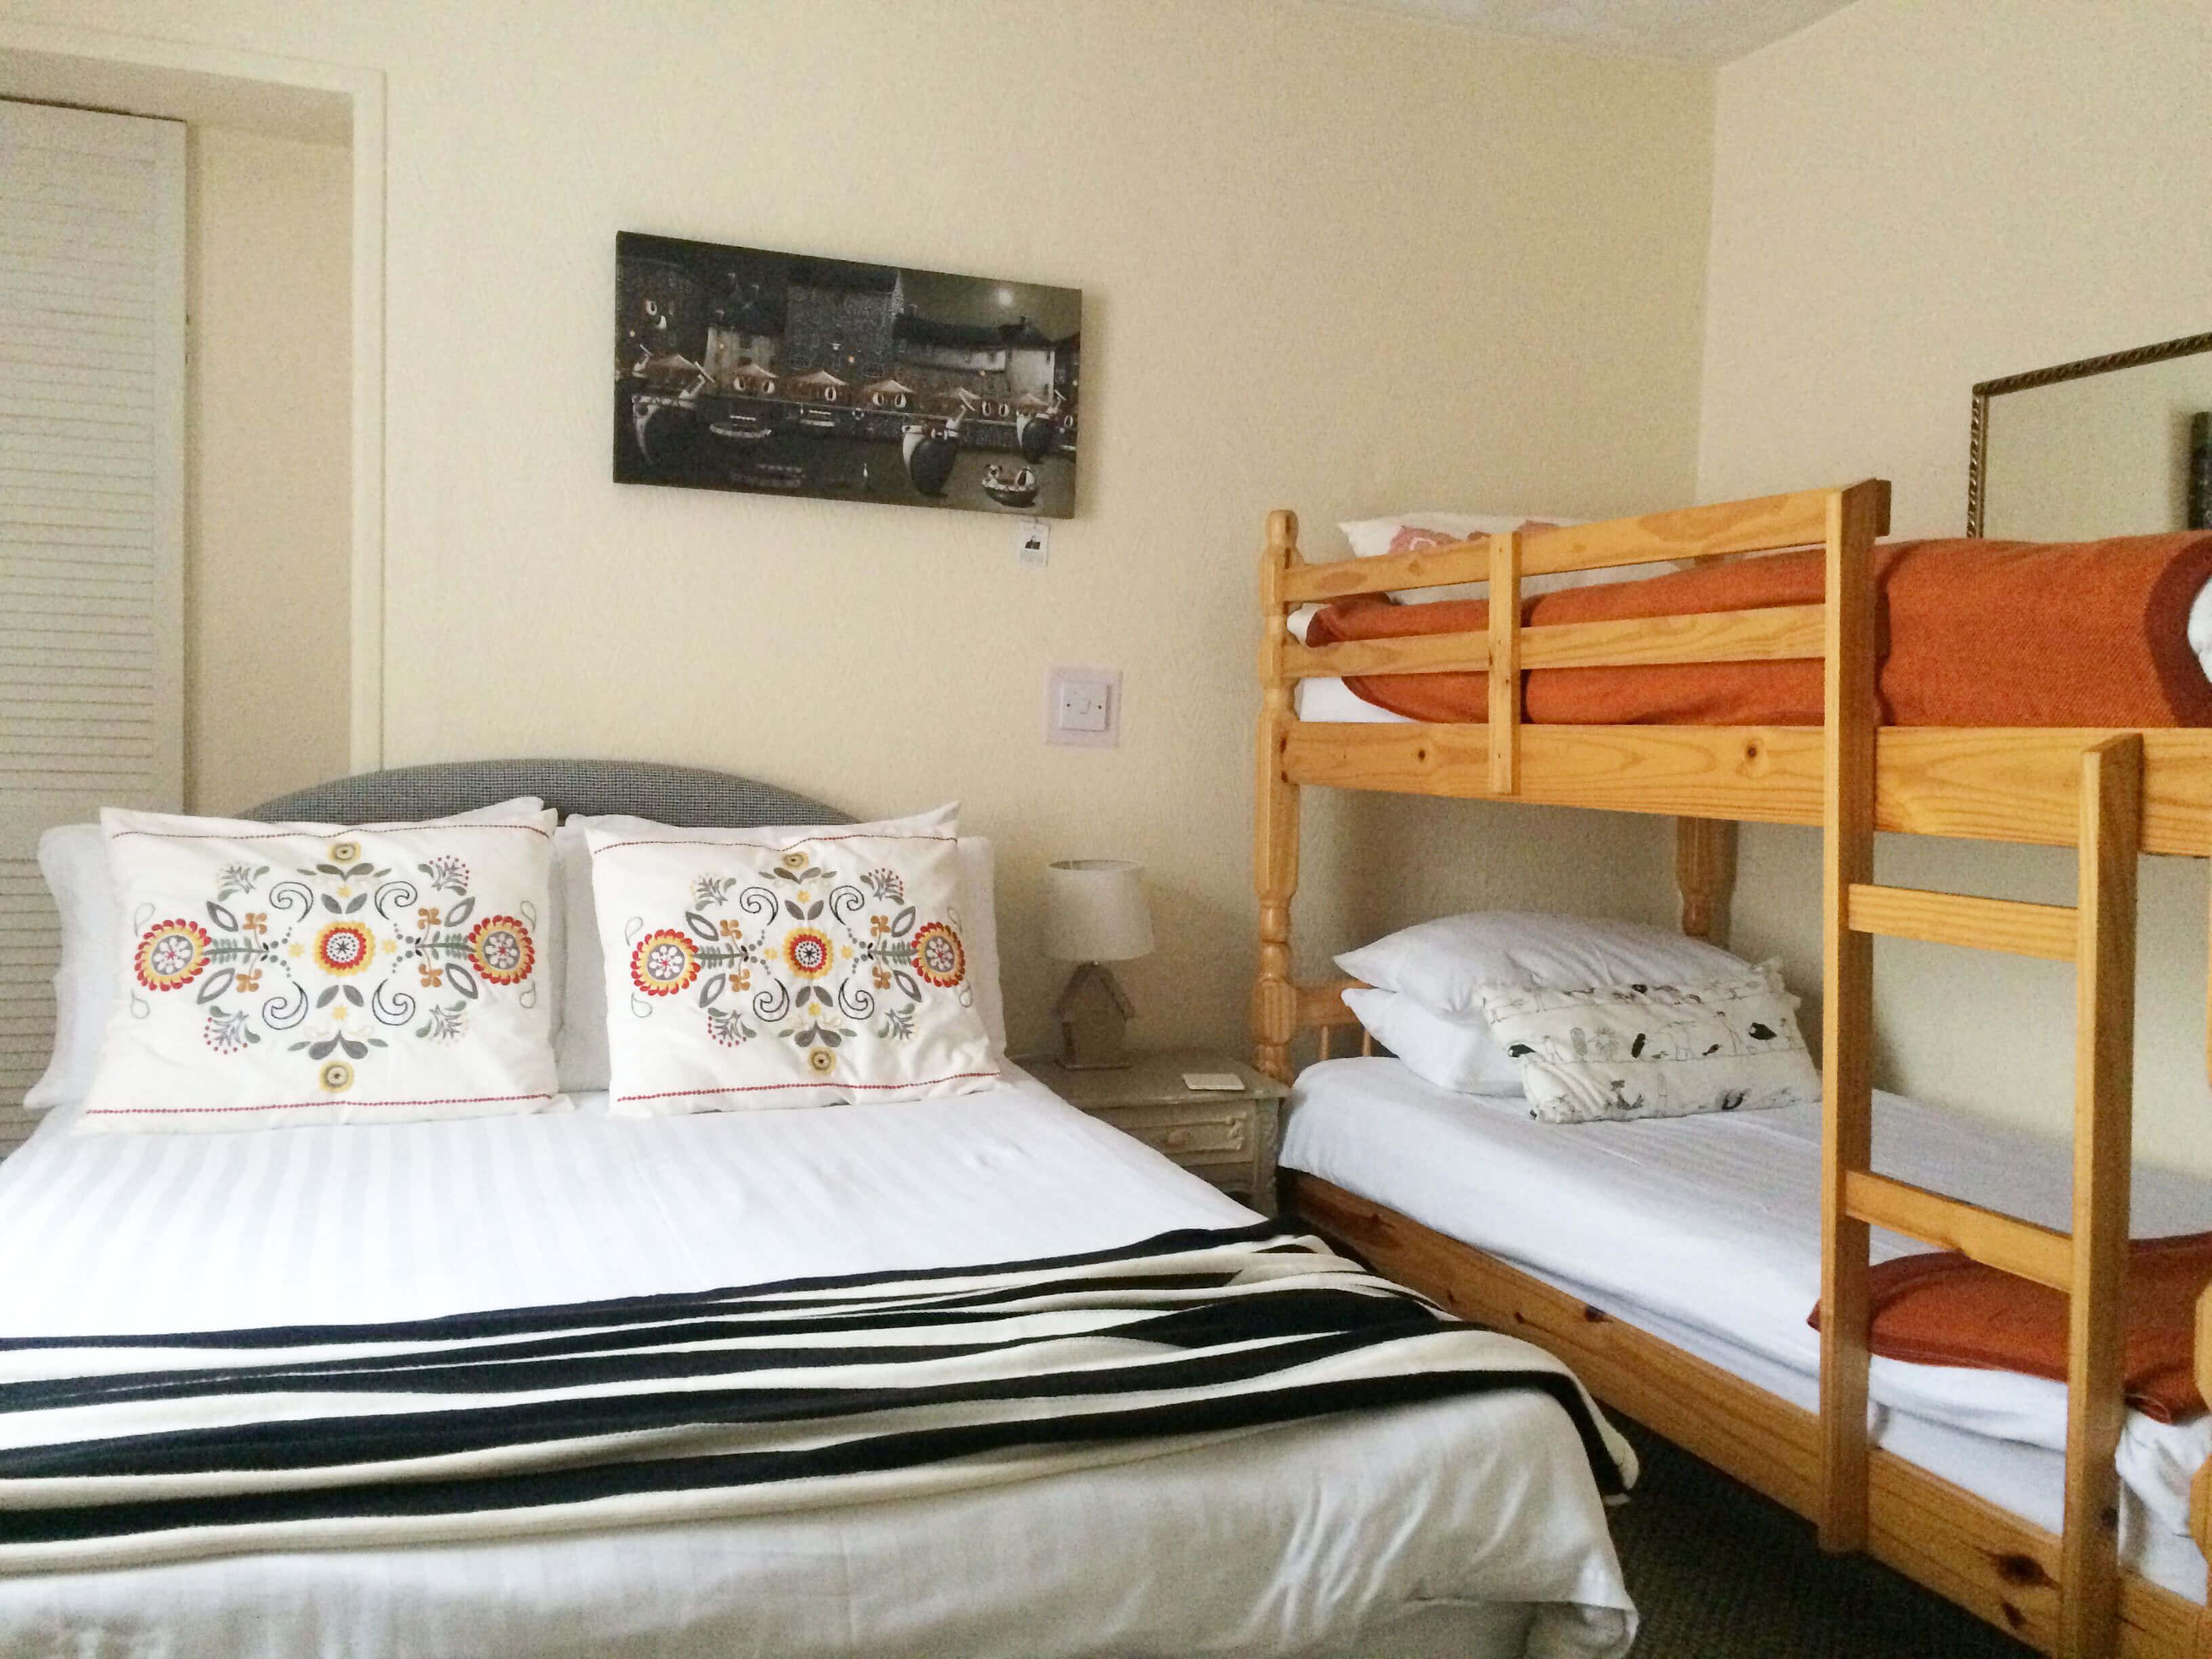 The Phantele Bed & Breakfast - Image 4 - UK Tourism Online